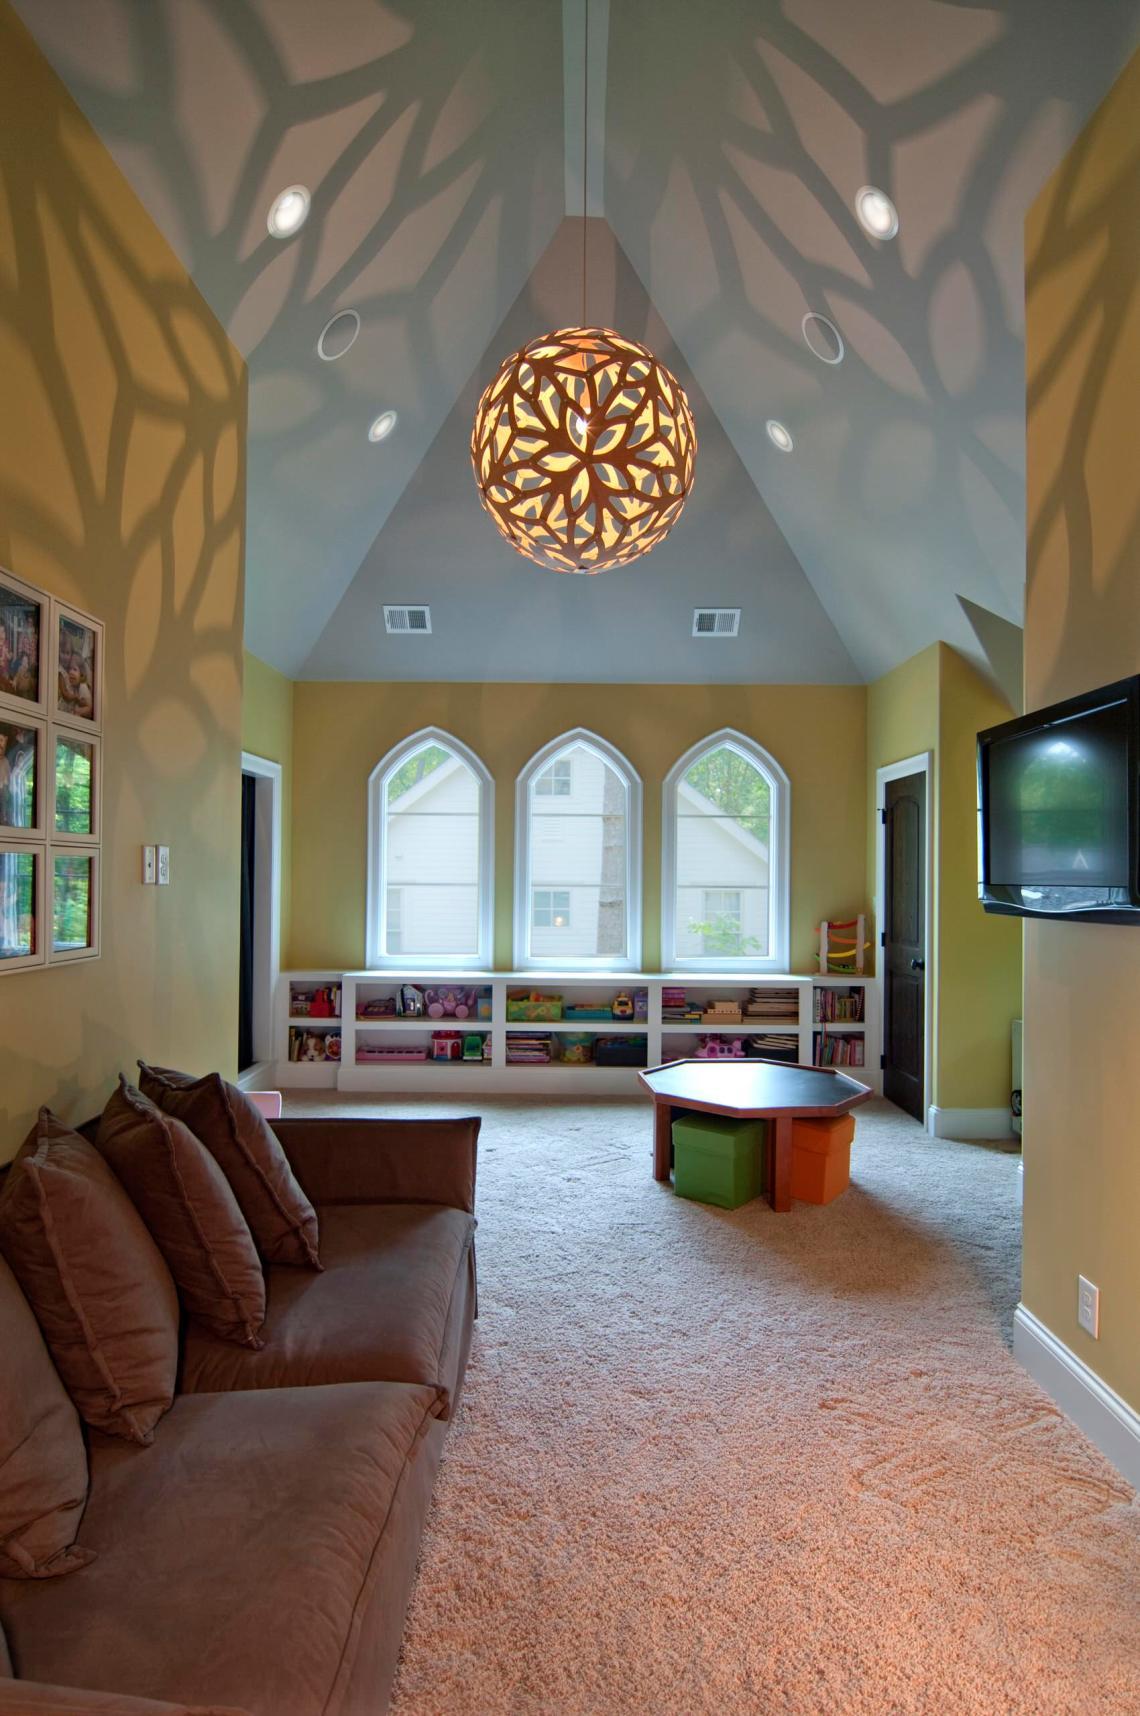 Vaulted Ceiling Kids Room Ideas Photos Houzz